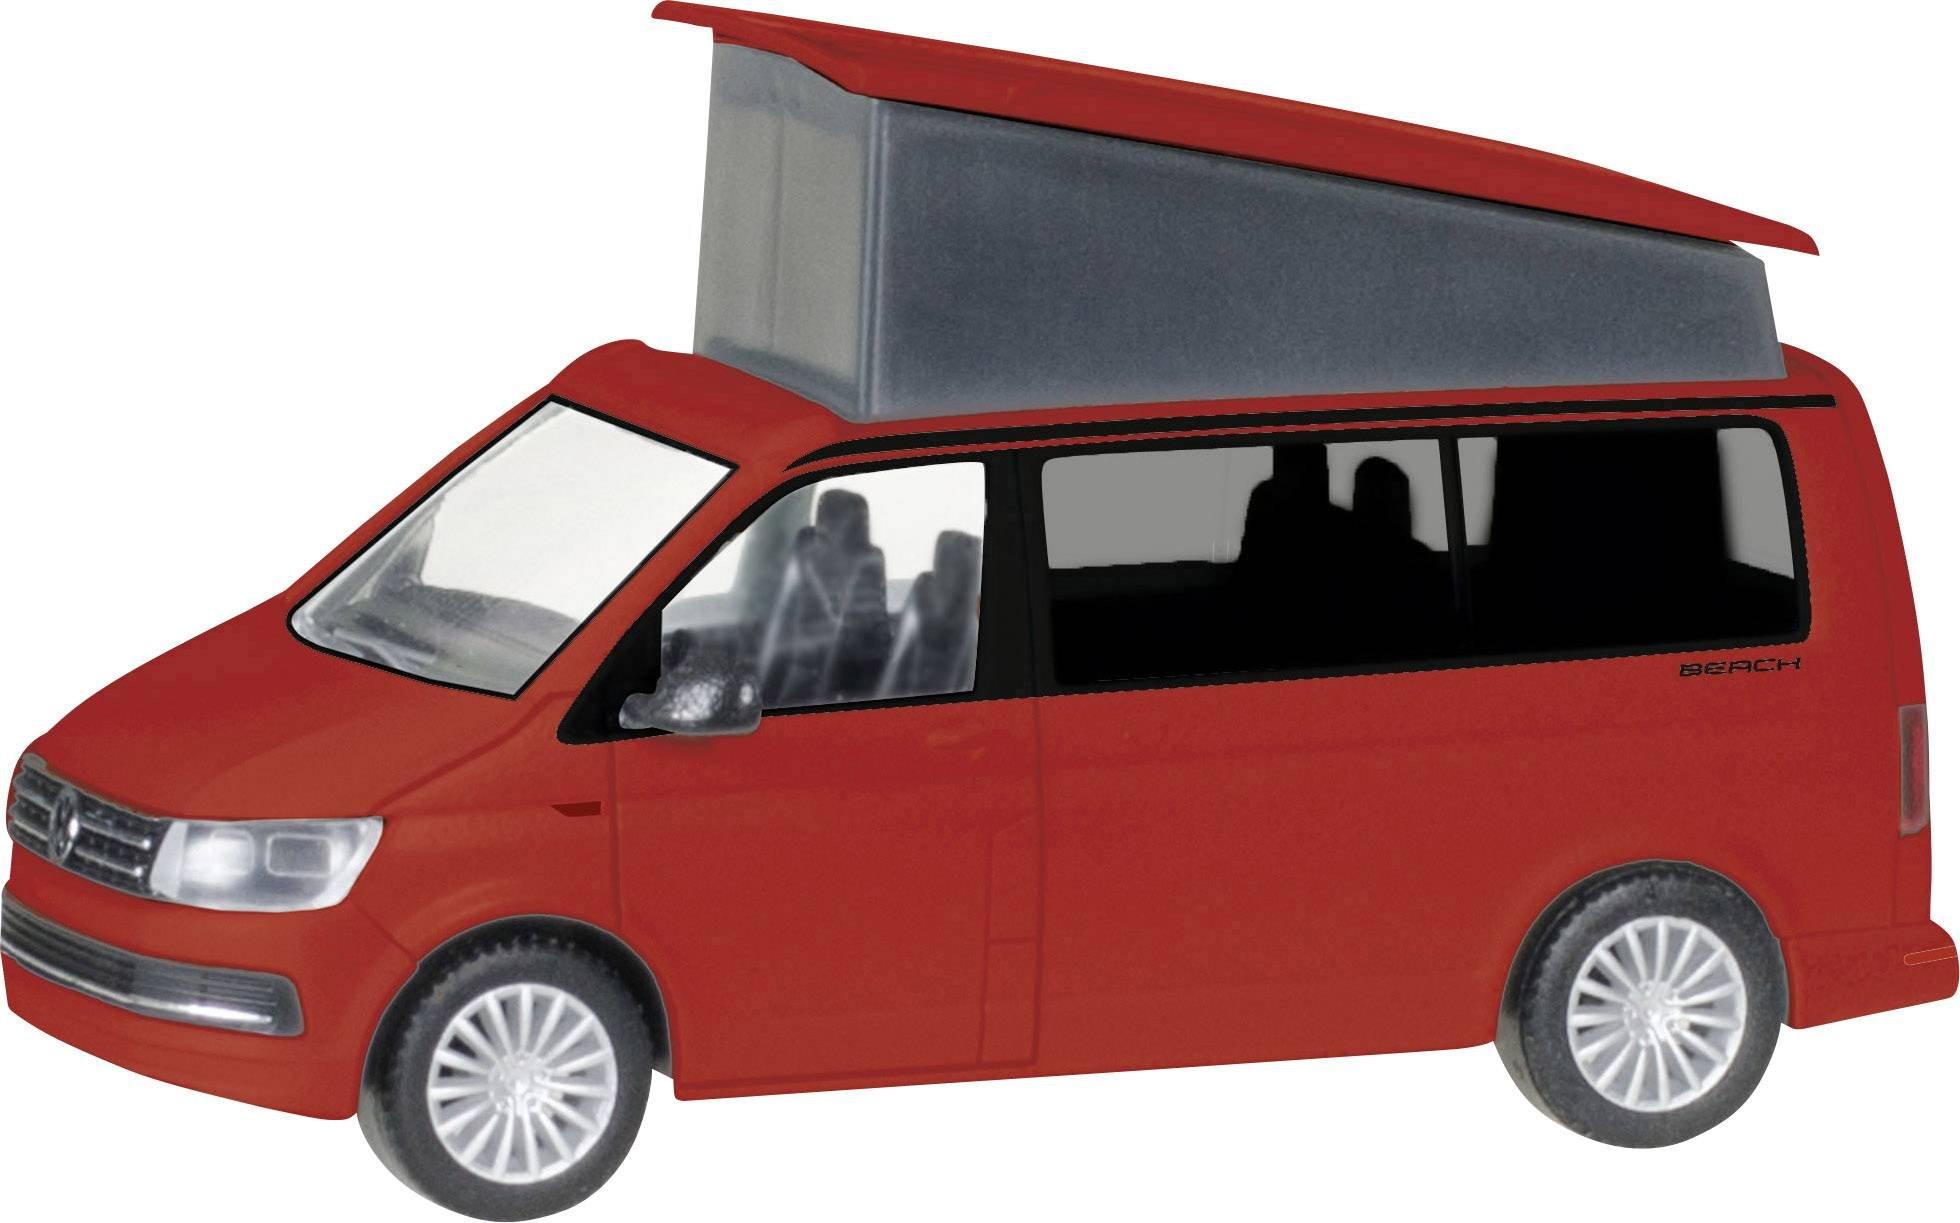 HERPA 028745-002'' Vw T6 California Model Set, Cherry Red